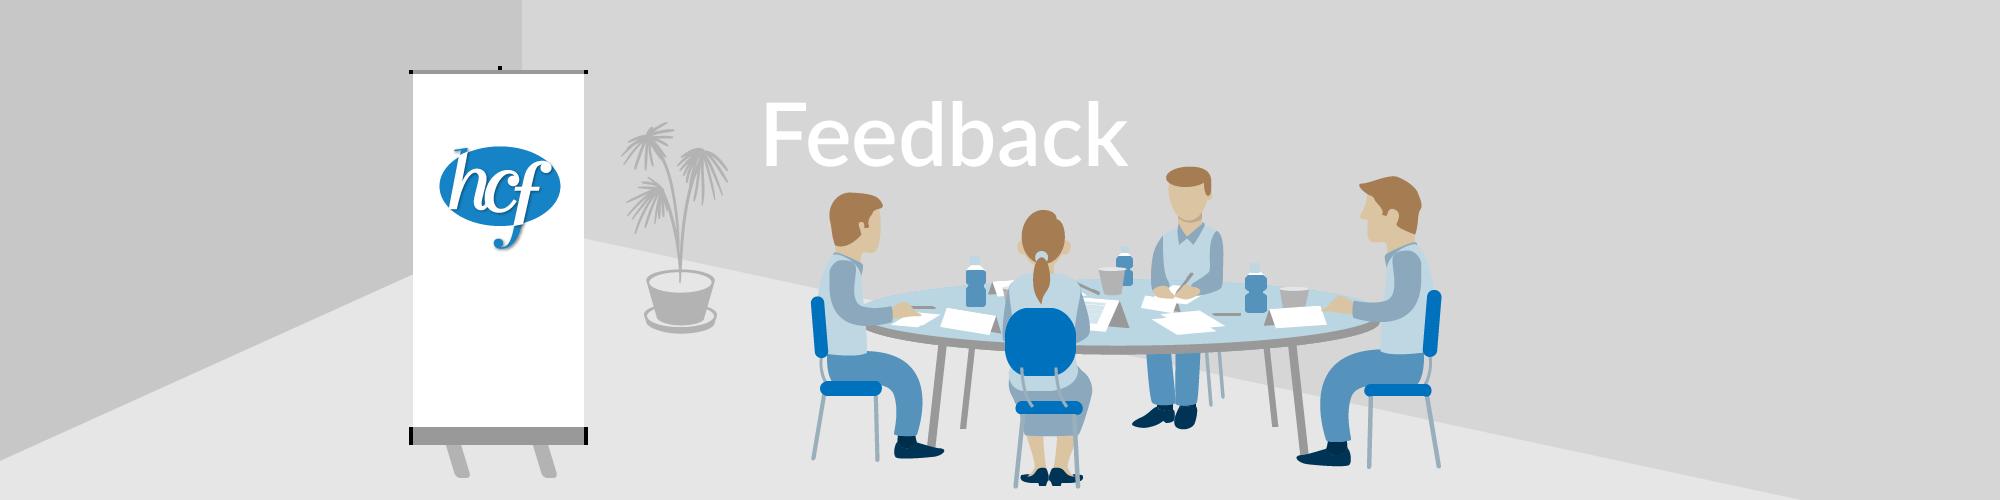 slider-feedback